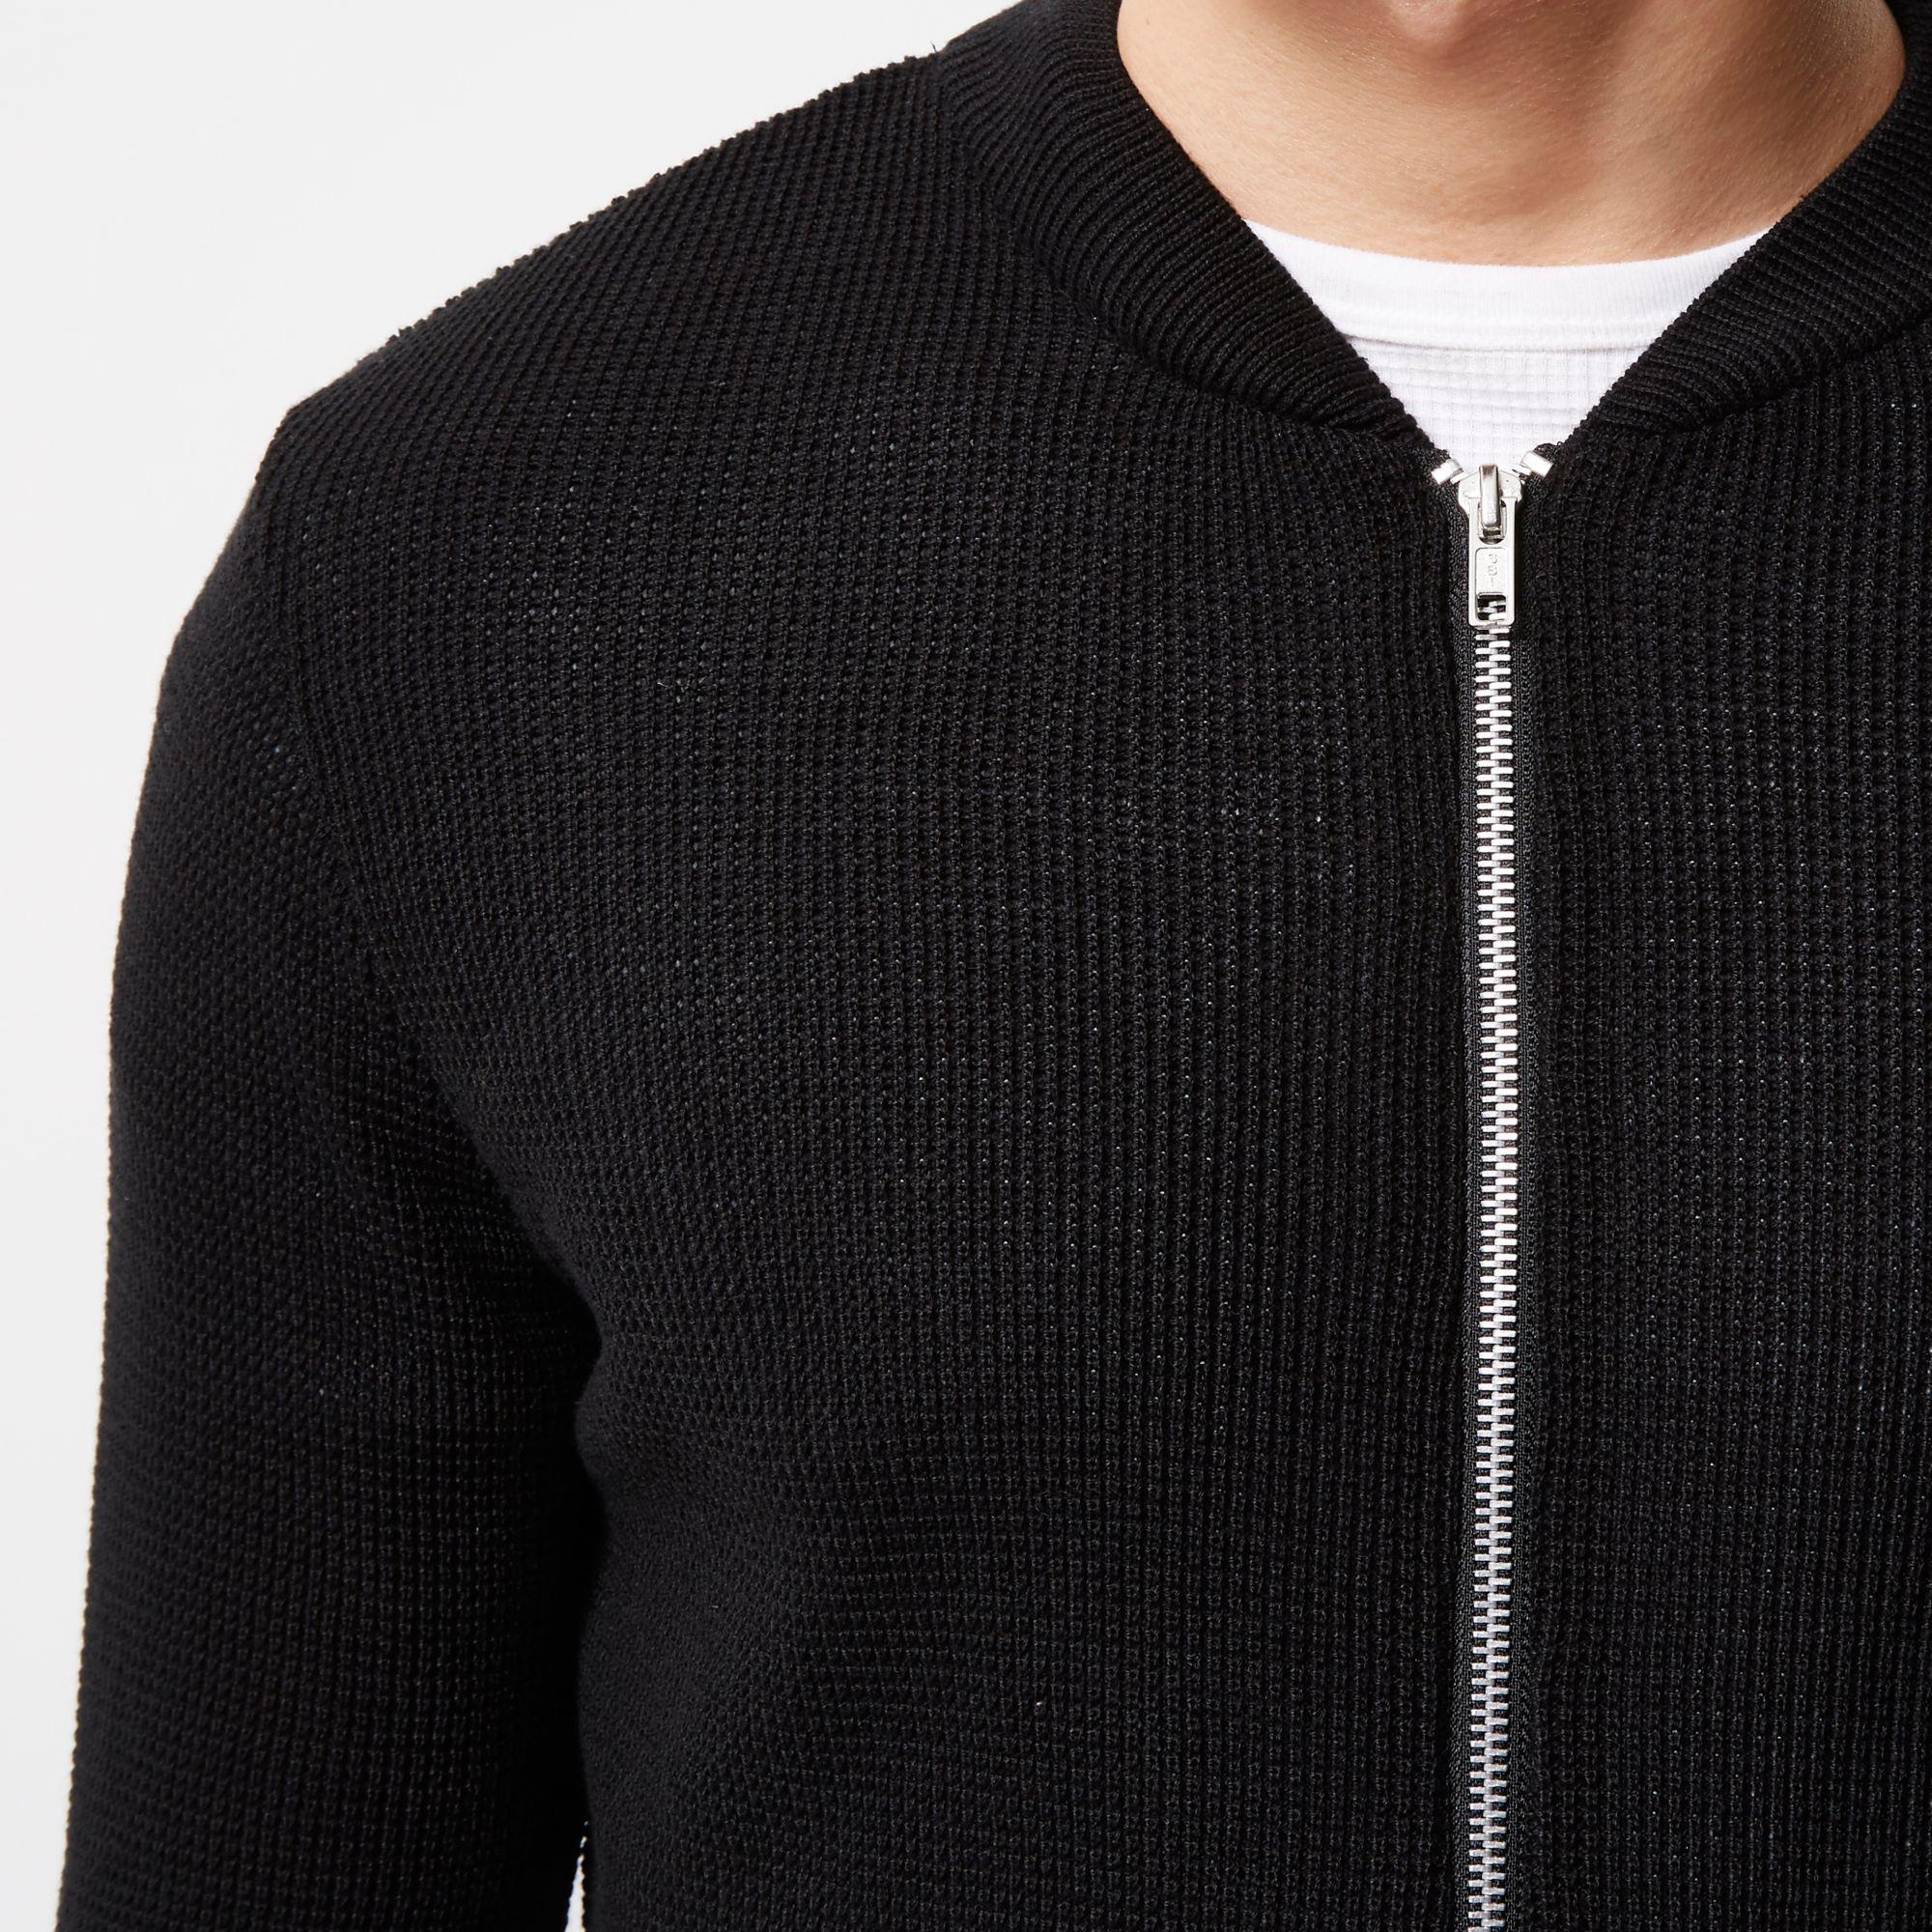 River Island Cotton Black Textured Knit Bomber Jacket for Men